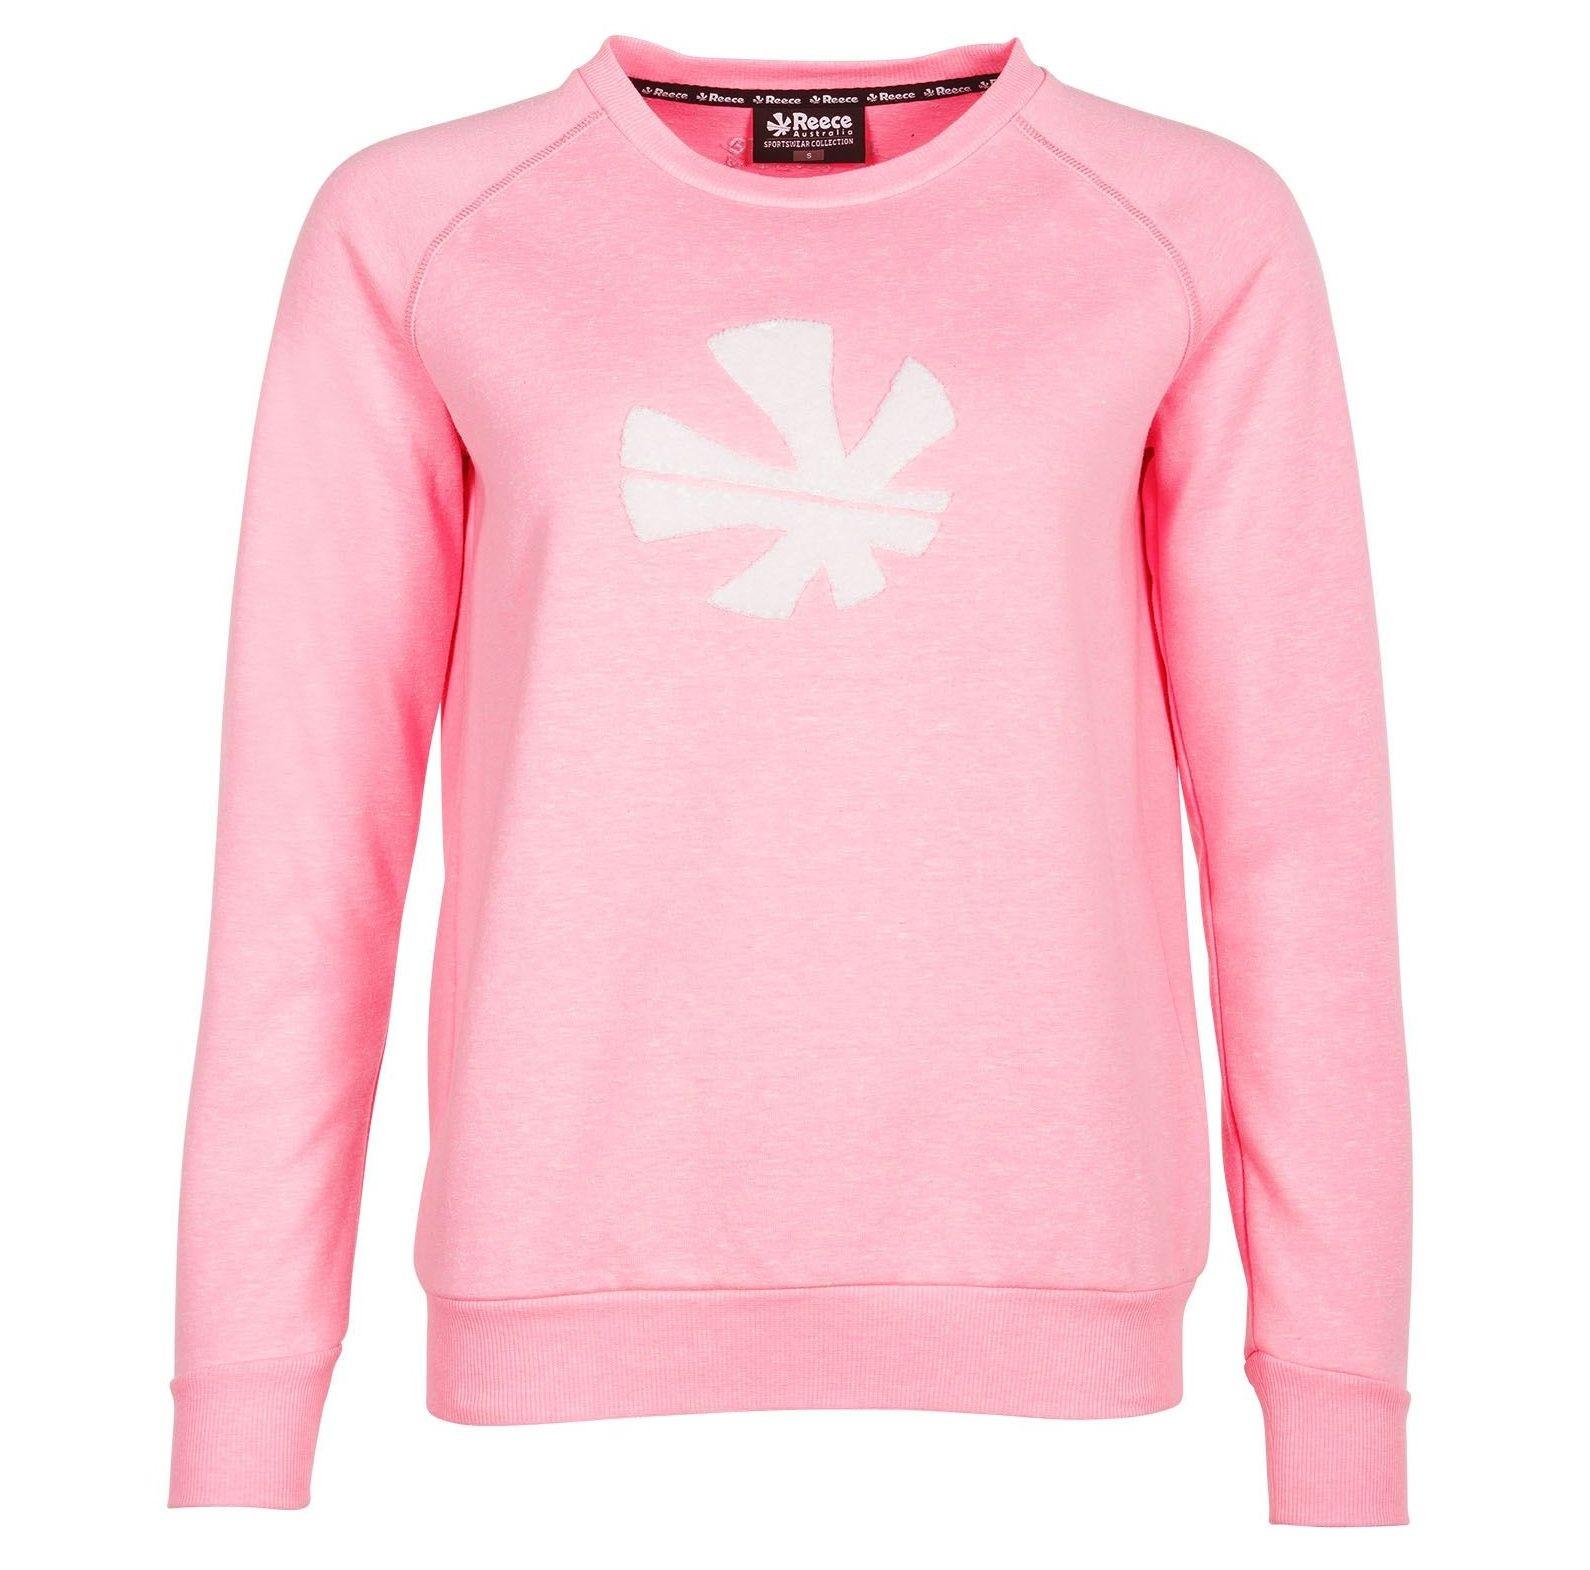 REECE AUSTRALIA CLASSIC bluza bawełniana damska